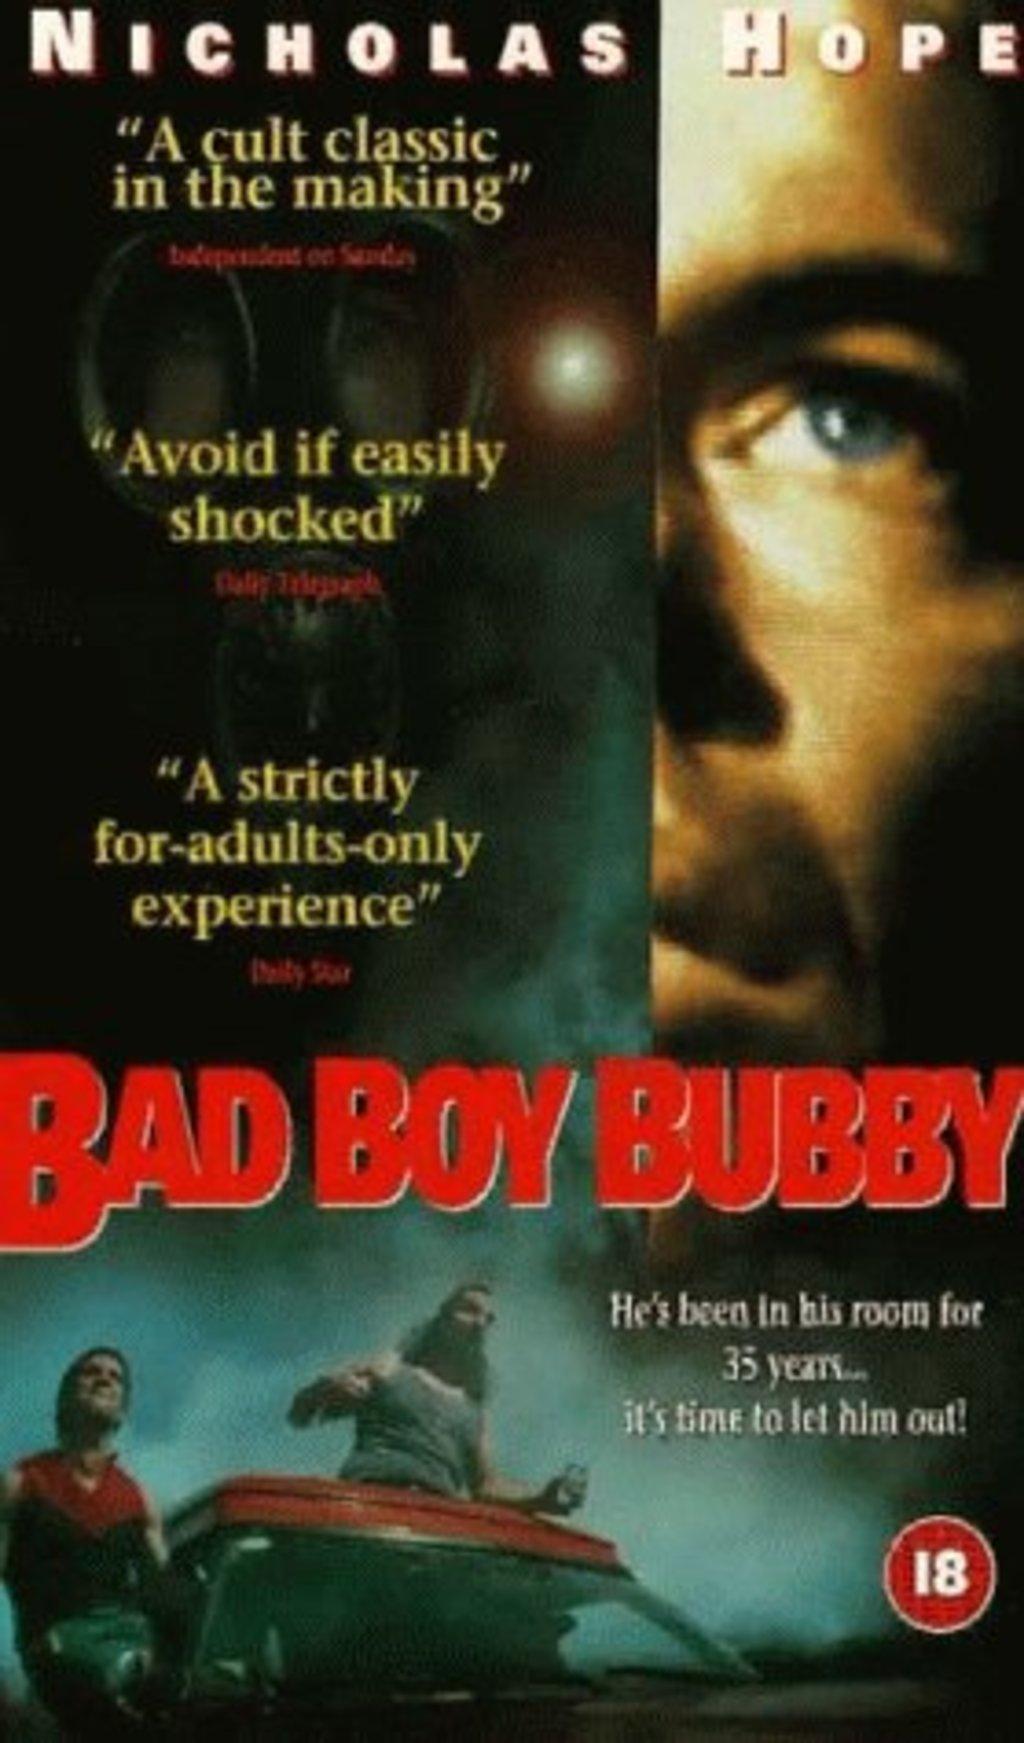 Watch Bad Boy Bubby On Netflix Today Netflixmovies Com